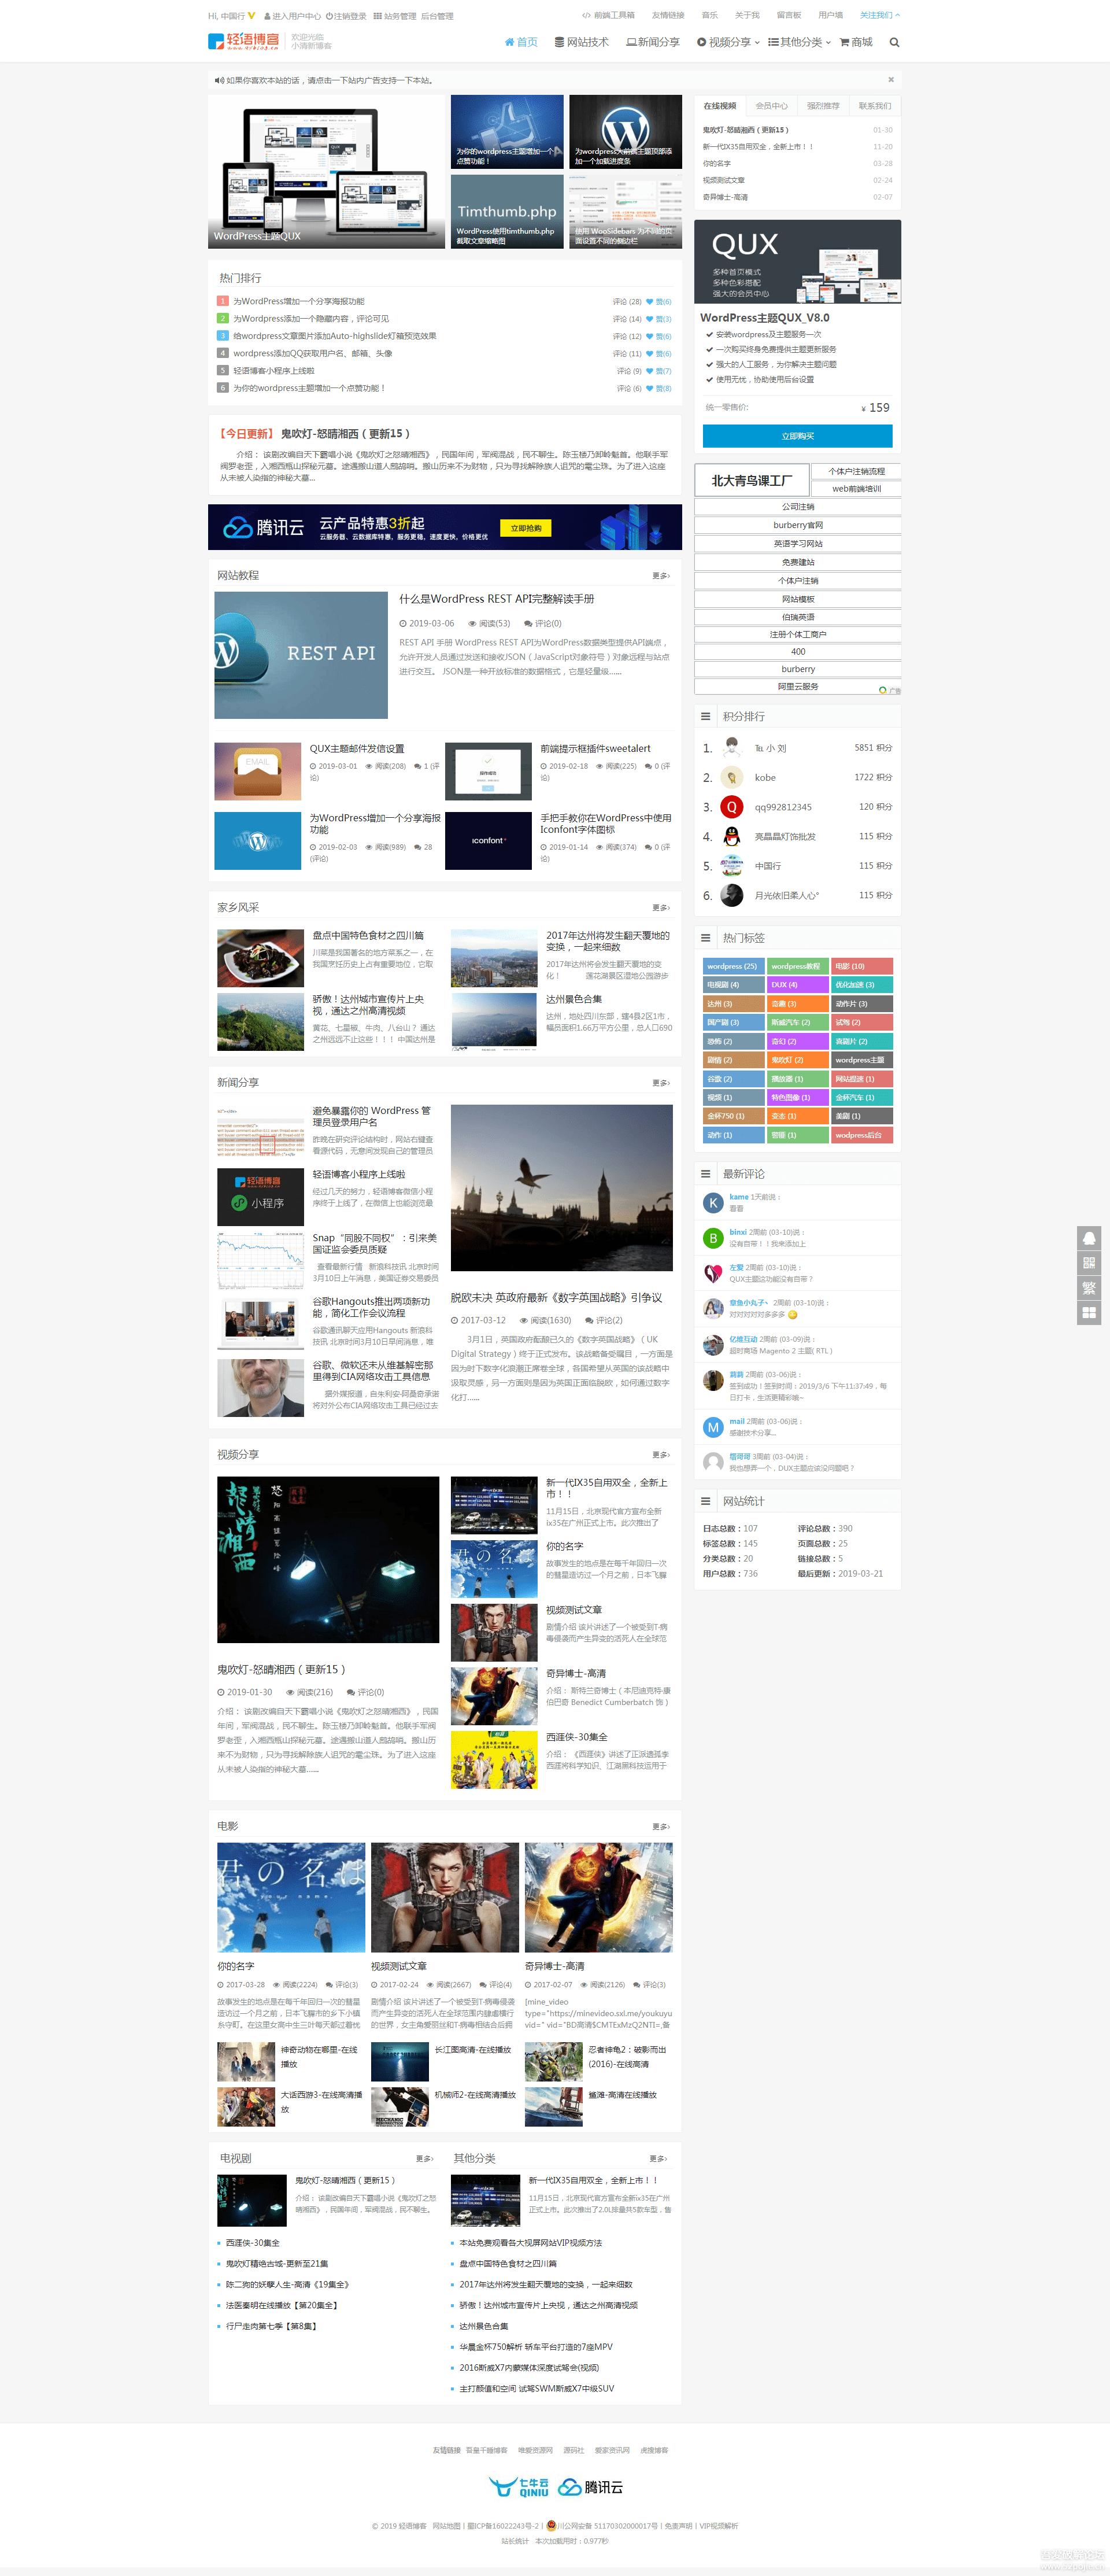 WordPress博客QUX主题V9.1.5版分享